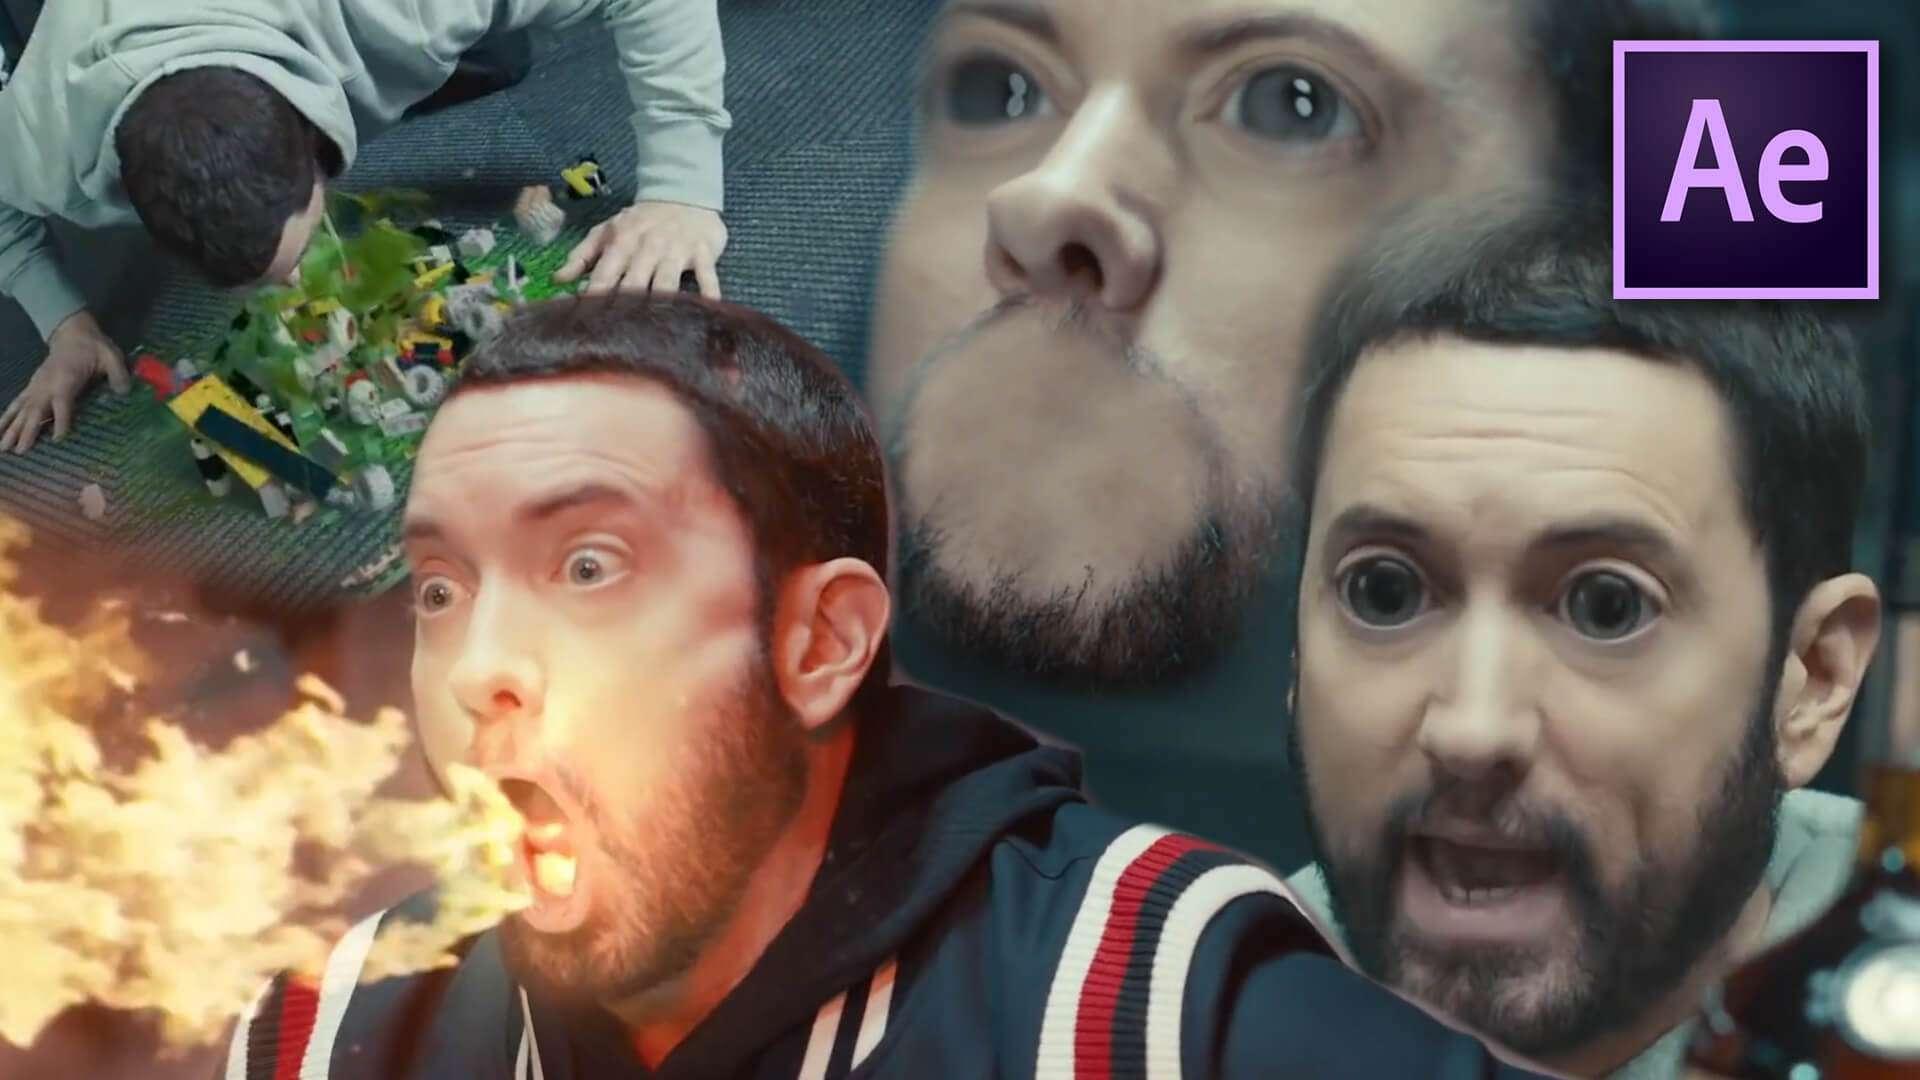 Eminem-Godzilla-Juice-WRLD-After-Effects-5-Effects-5-Minutes